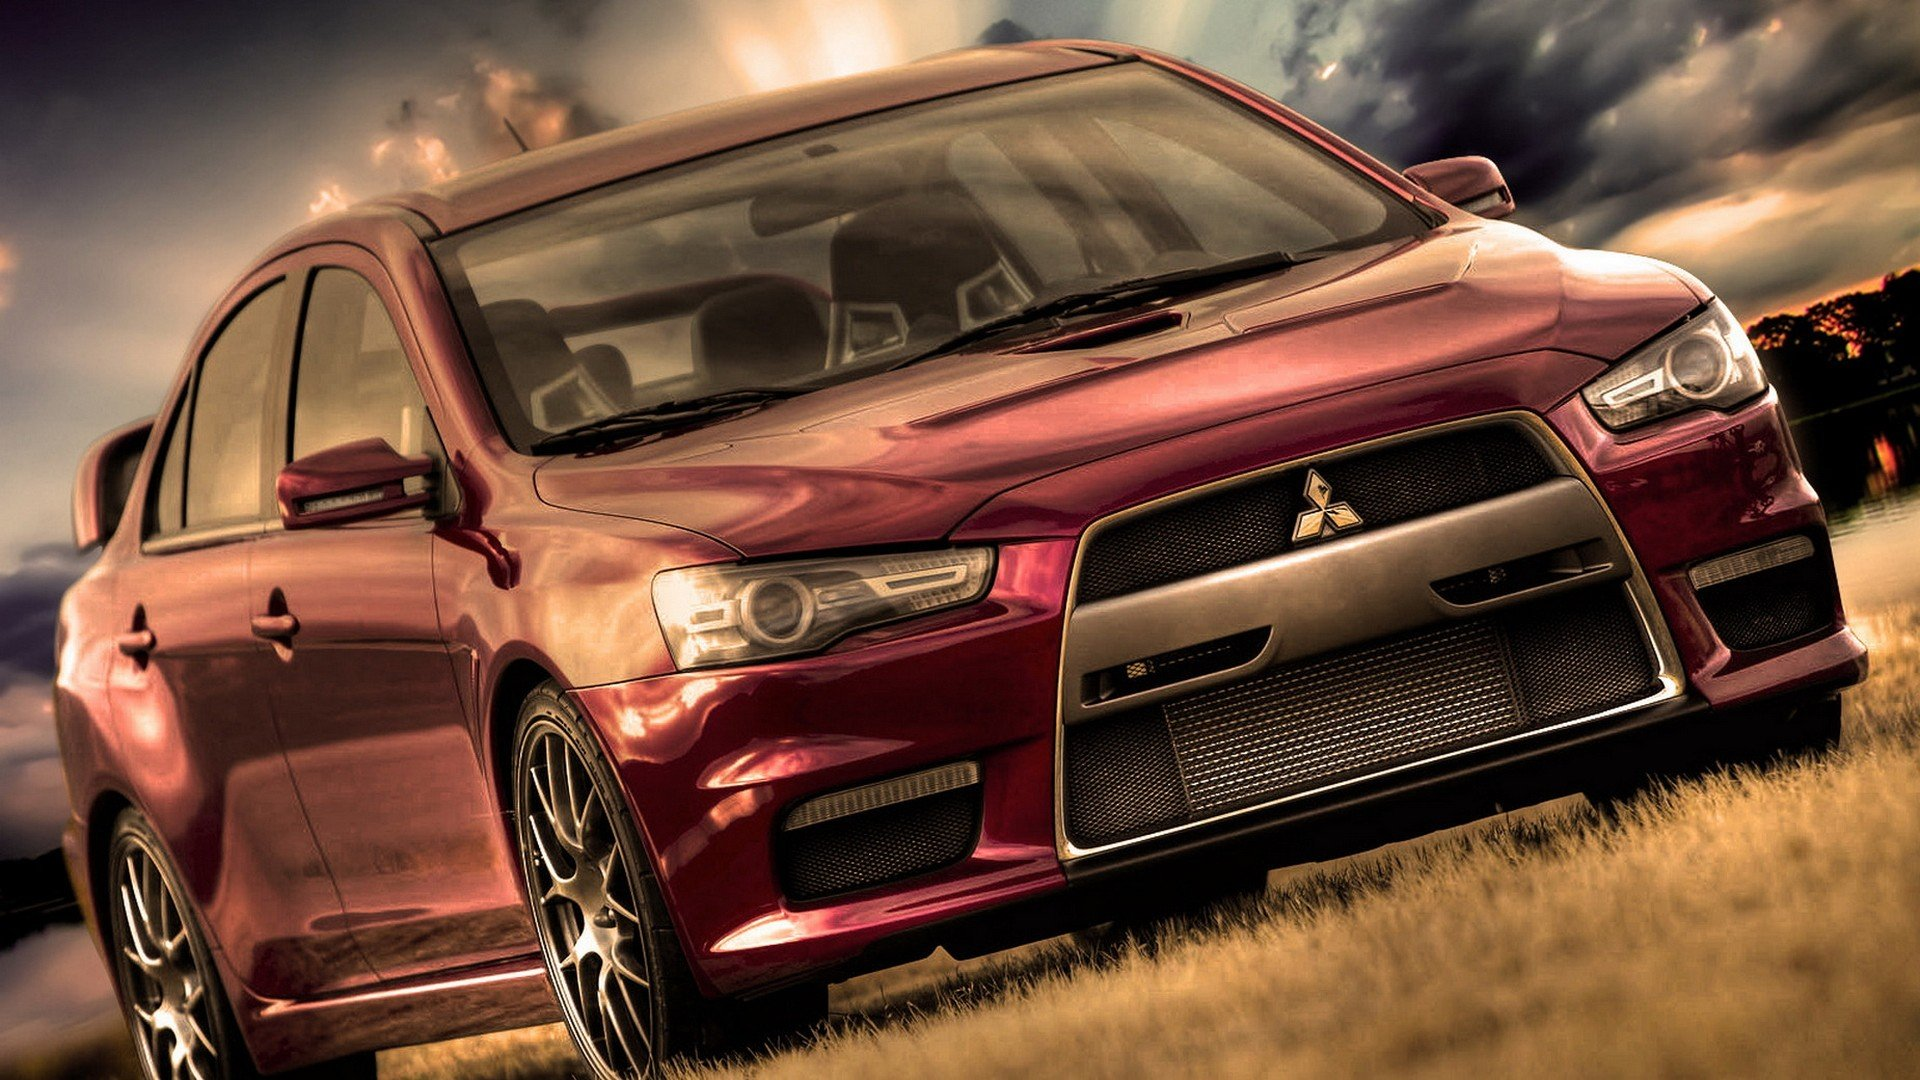 cars vehicles wheels mitsubishi lancer evolution x wrc automobiles wallpaper 1920x1080 272948 wallpaperup - Mitsubishi Lancer Evolution 2014 Wallpaper